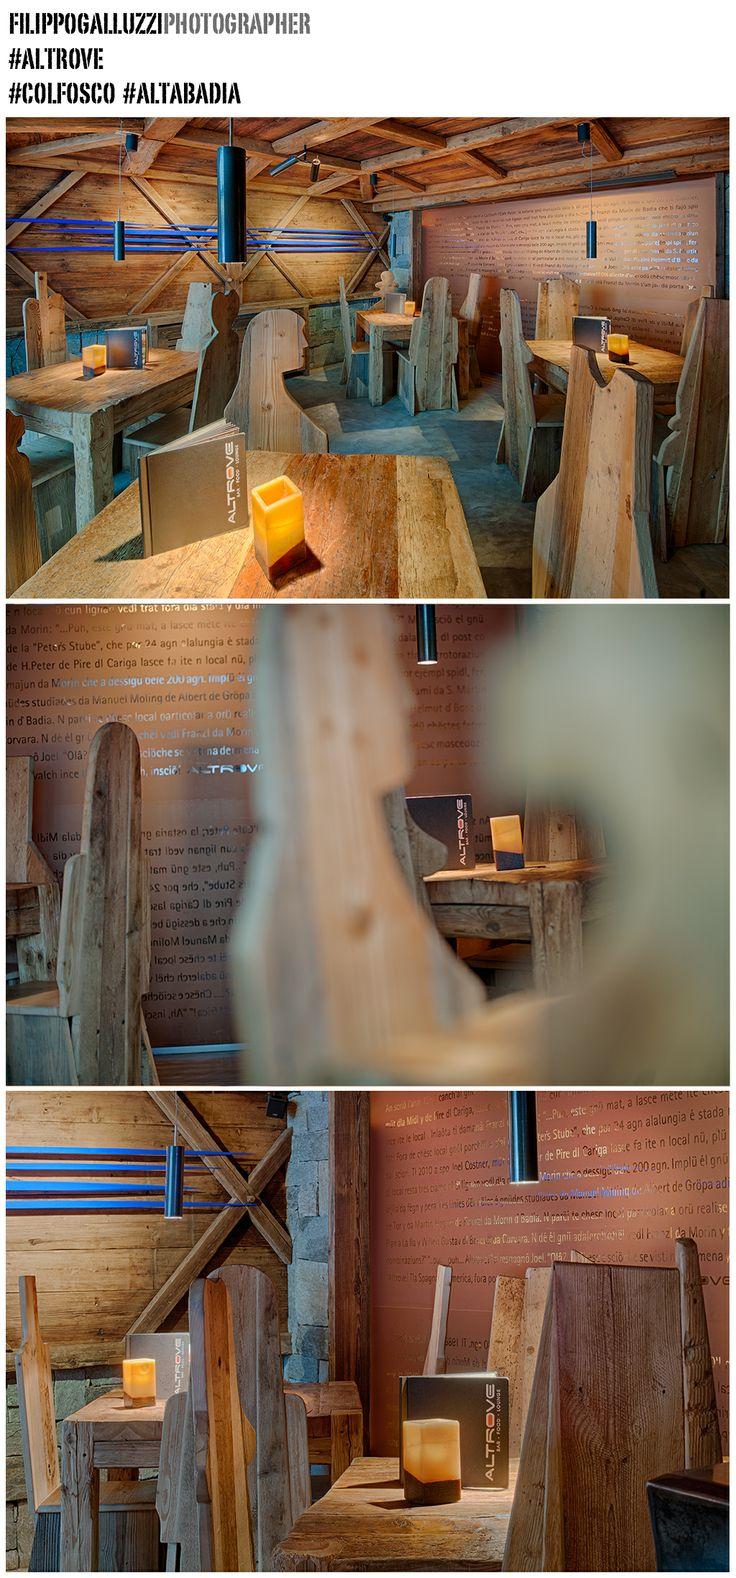 appartamenti Peter - pub altrove  #colfosco #altabadia #corvara #altoadige